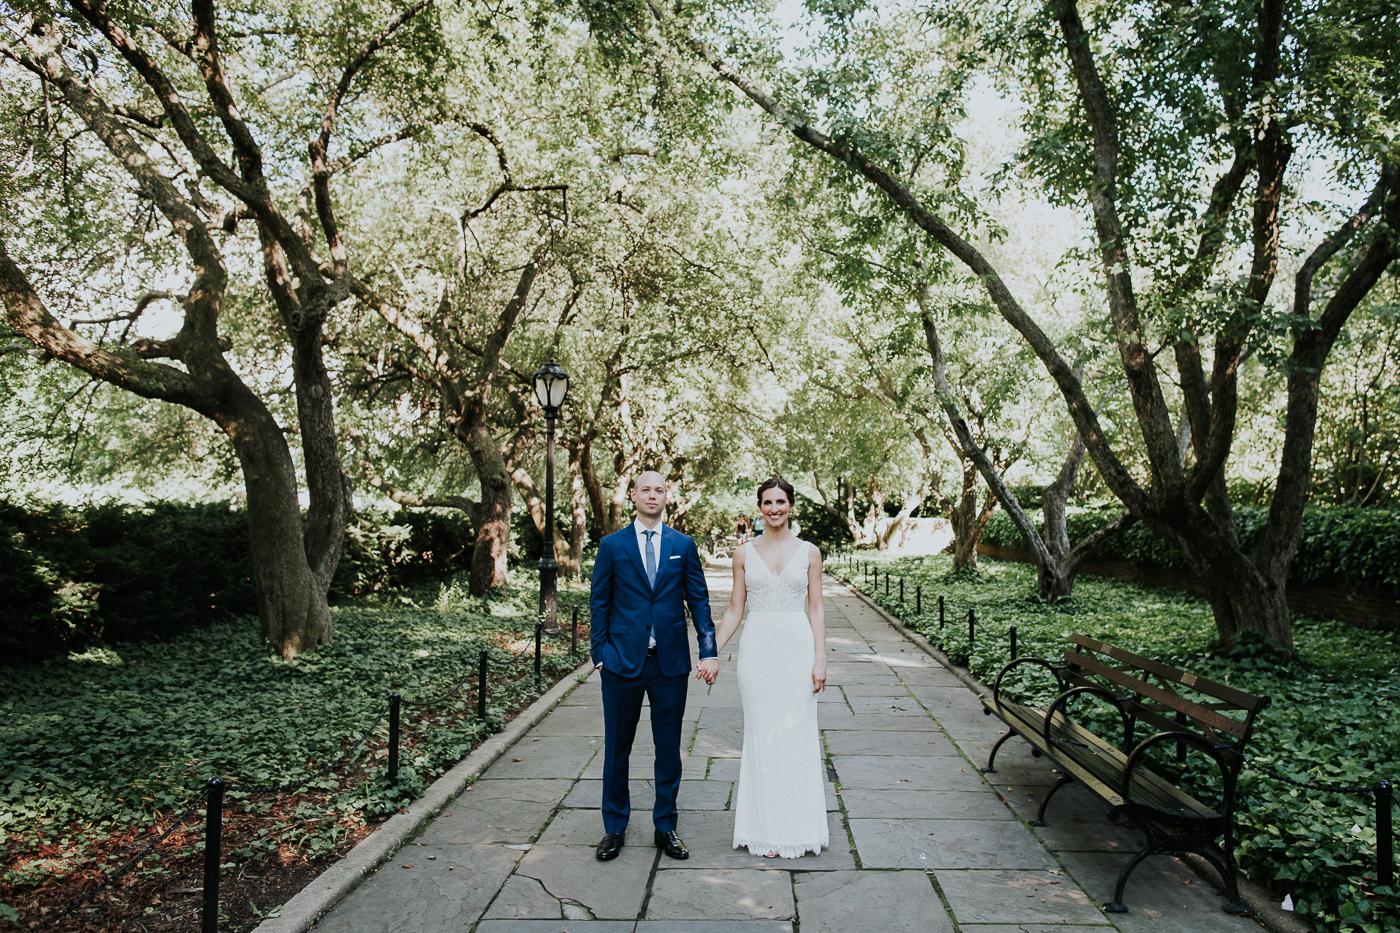 NYC-Central-Park-Conservatory-Garden-Intimate-Elopement-Documentary-Wedding-Photographer-39.jpg